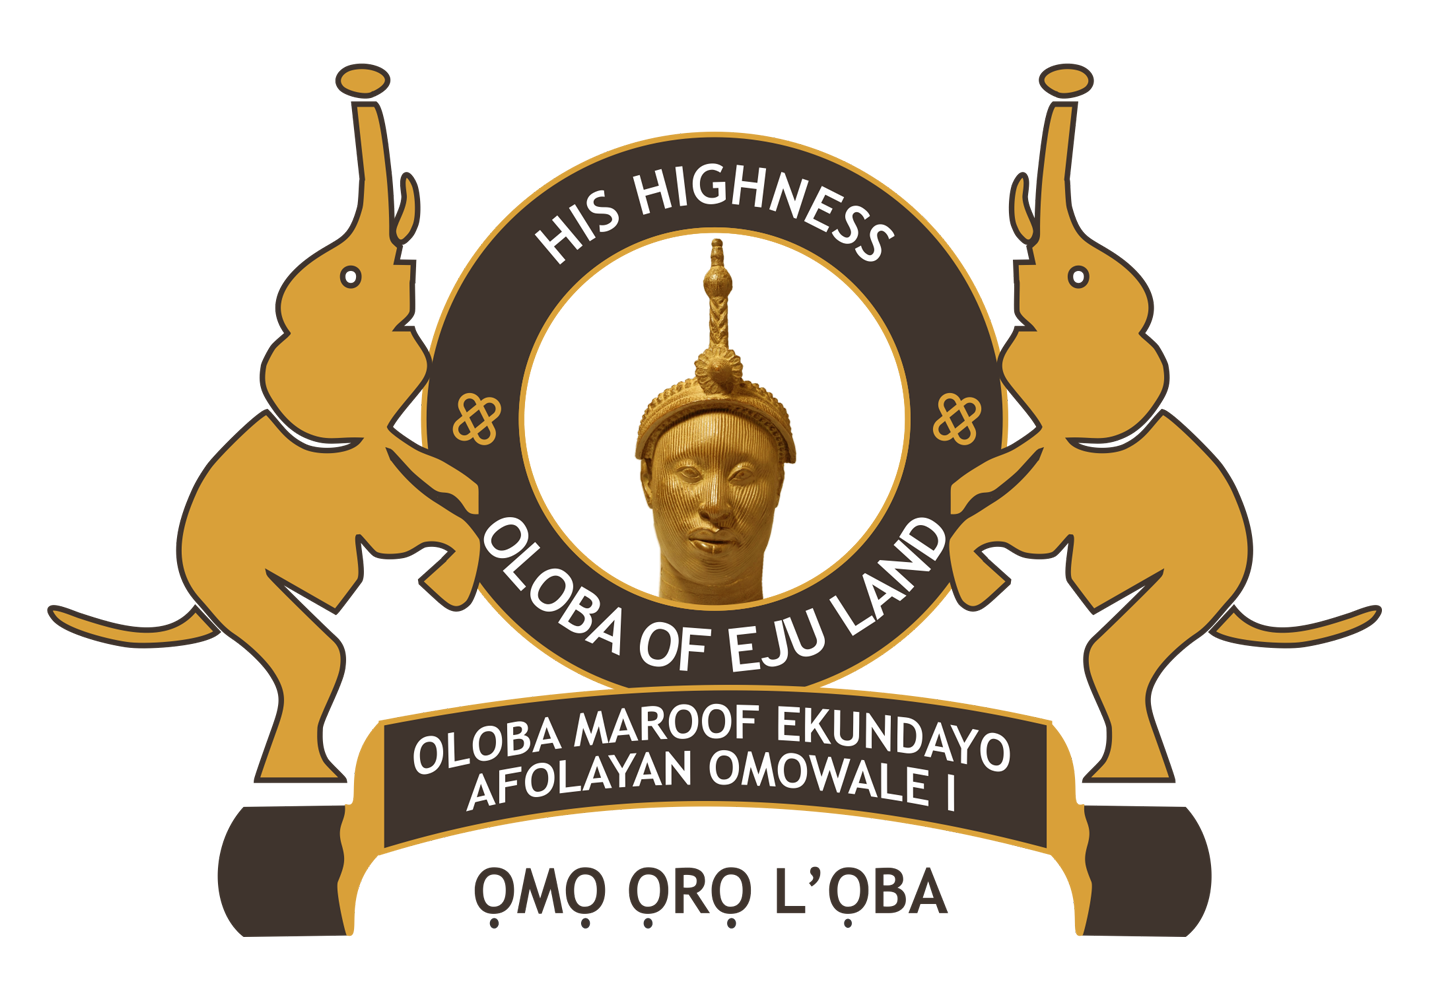 His Highness, Oloba Maroof Ekundayo Afolayan